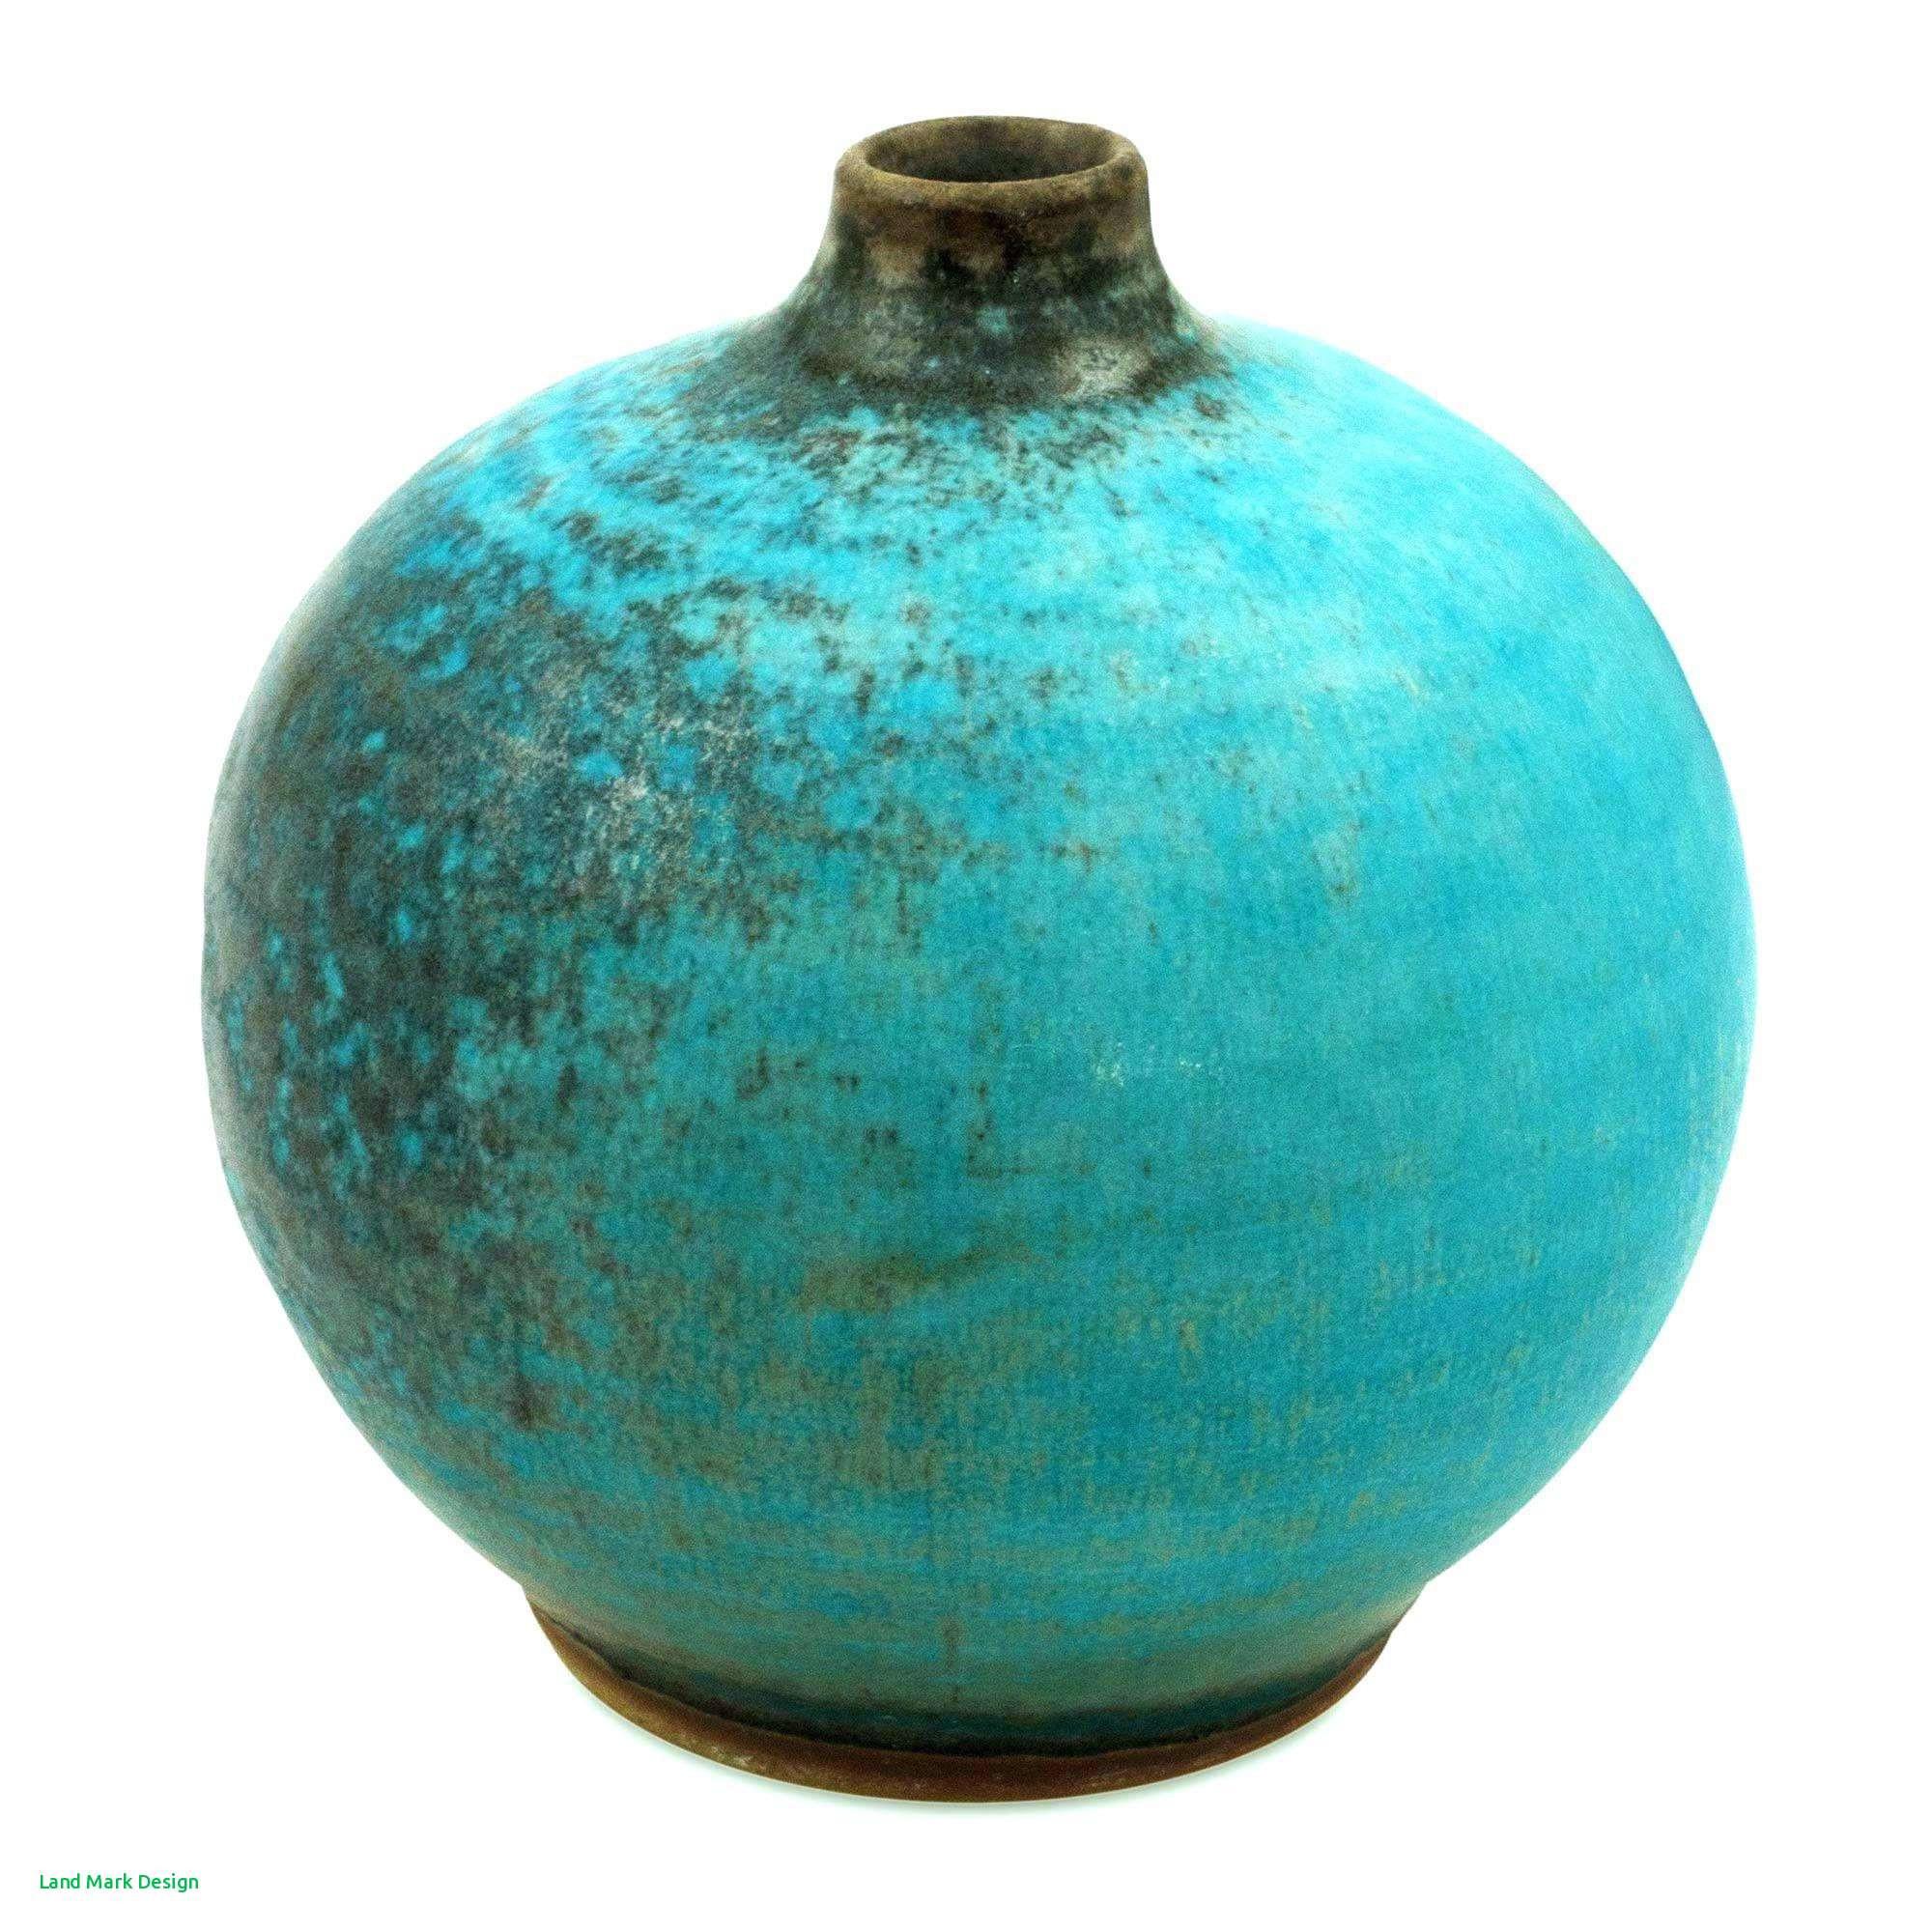 large teal floor vase of teal floor vase design home design throughout outdoor rug ikea lovely living room ikea vases luxury pe s5h vases ikea floor vase i